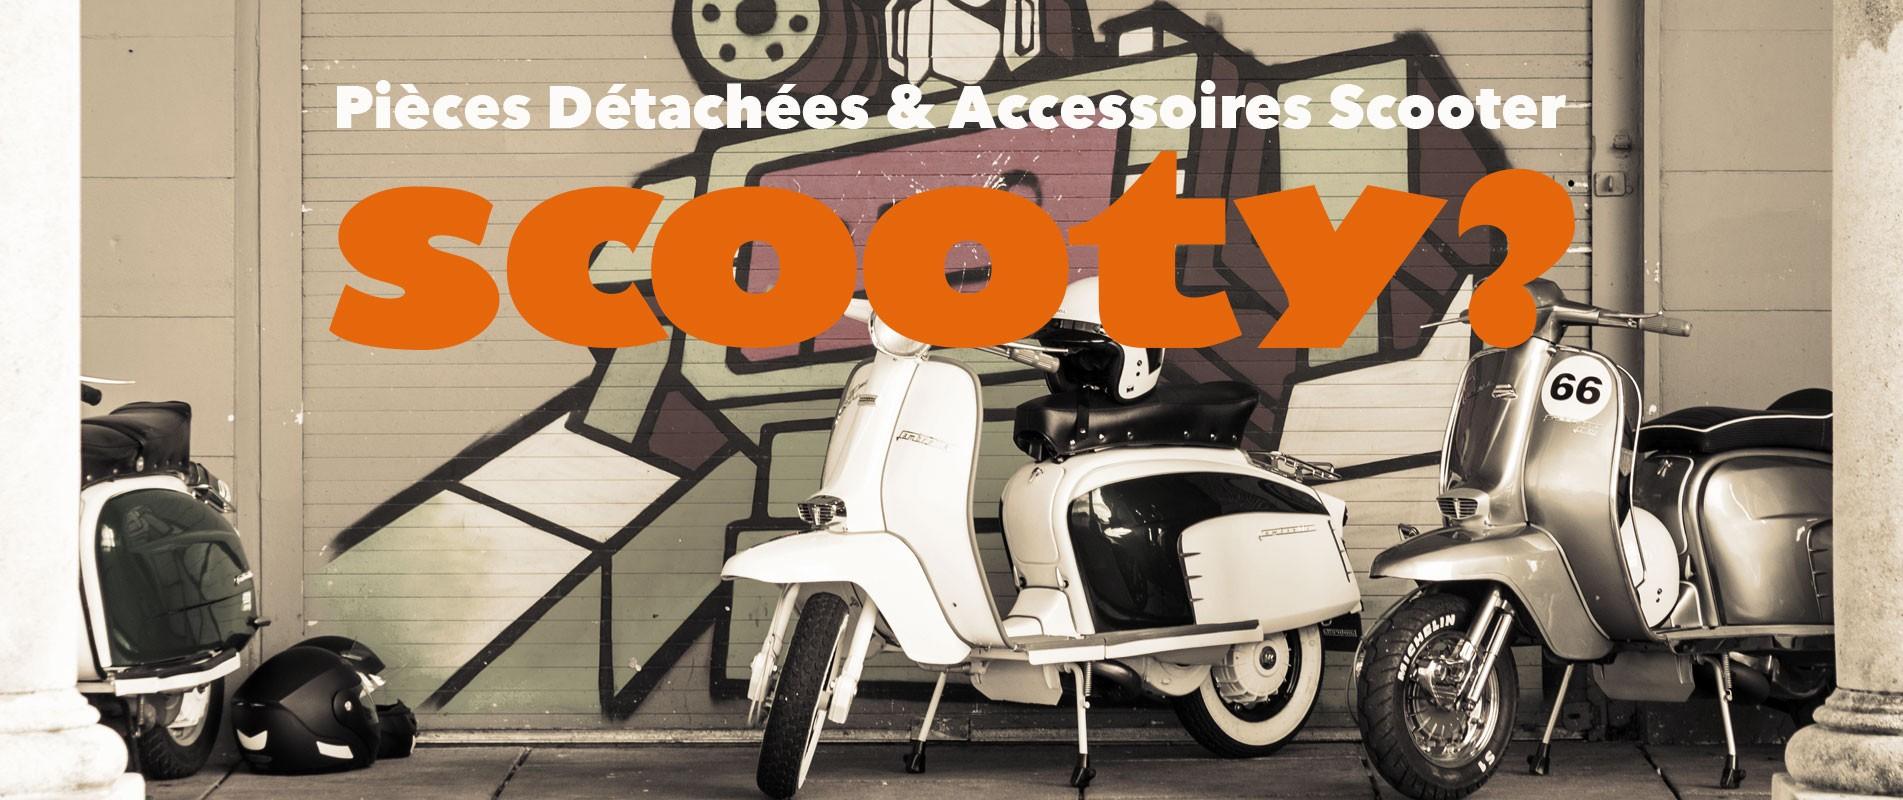 Scooty?